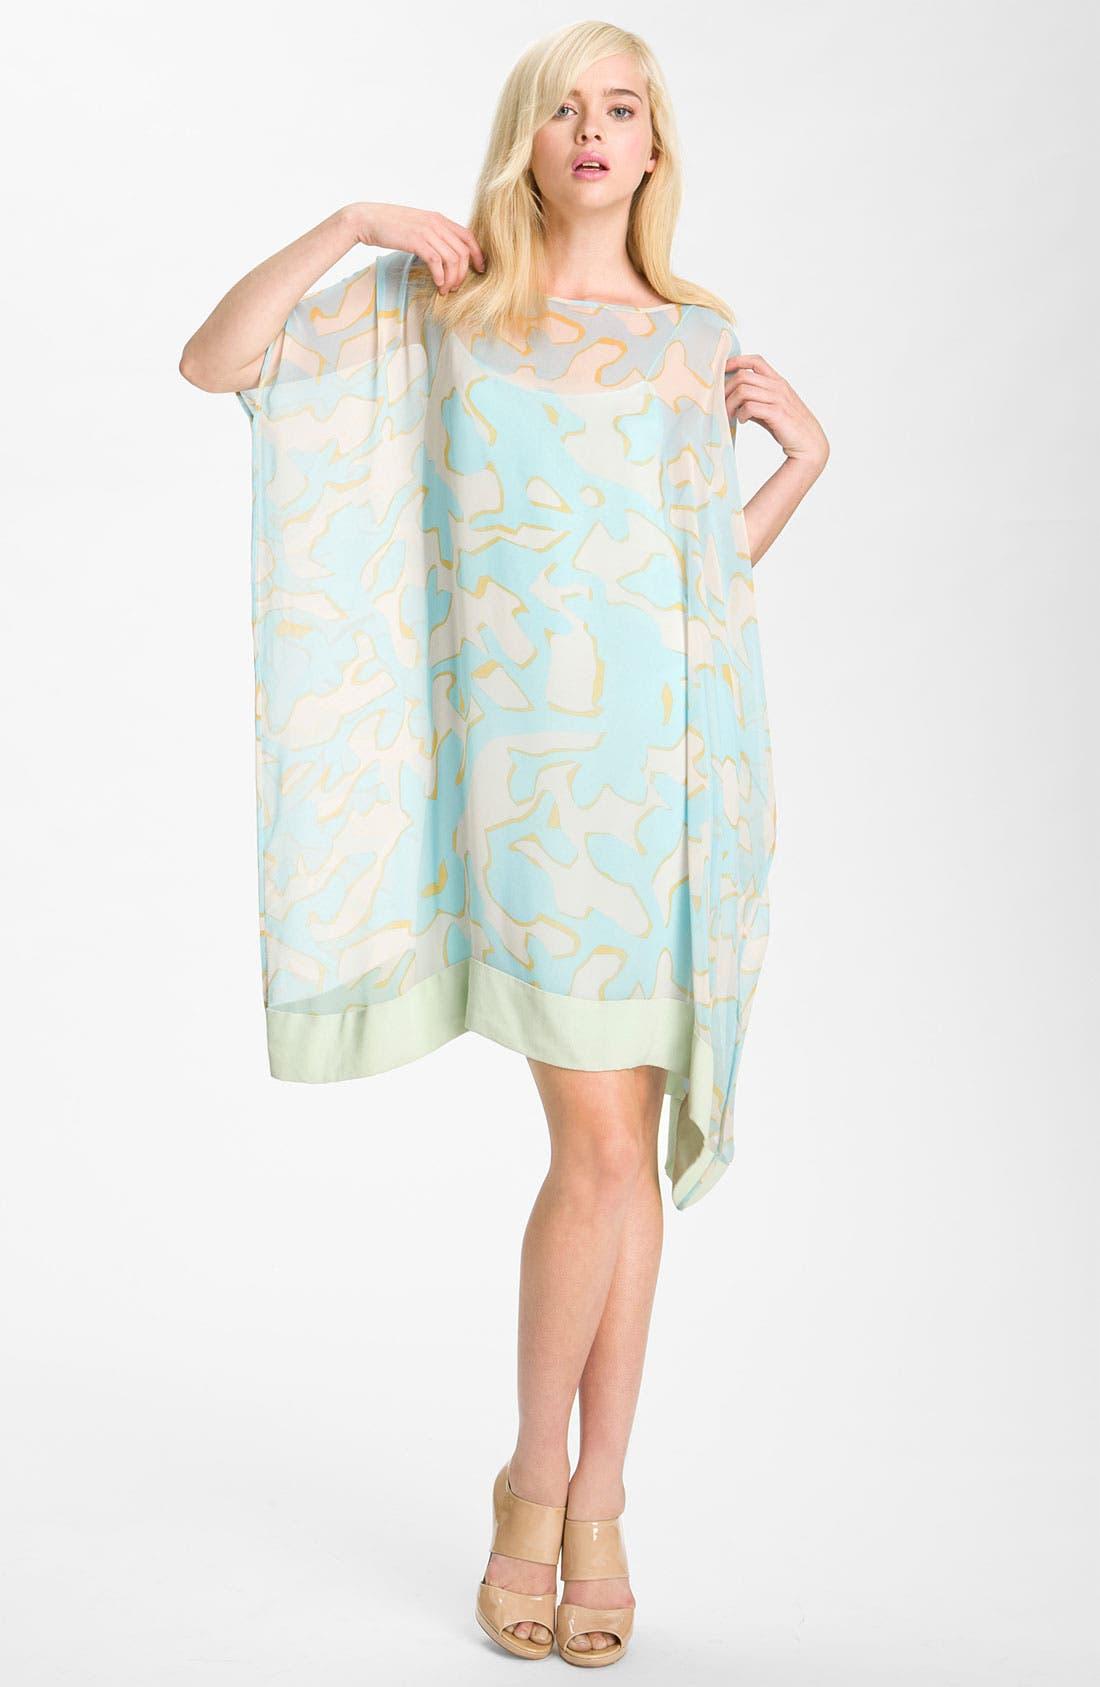 Alternate Image 1 Selected - Diane von Furstenberg 'New Hanky' Print Silk Dress